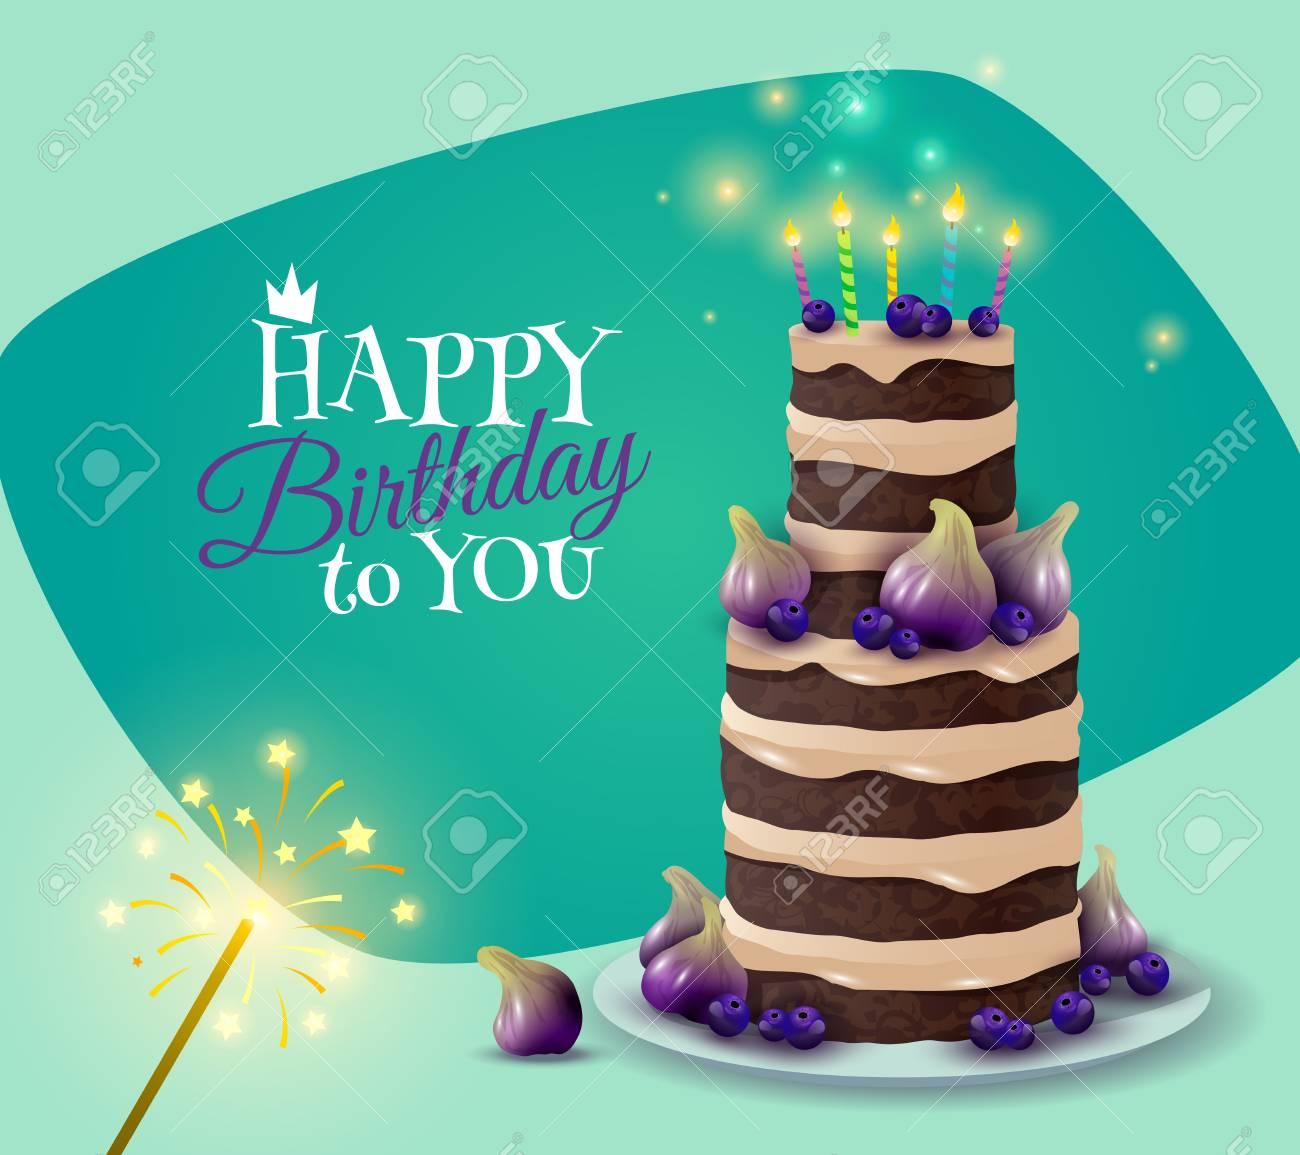 Birthday Cake Card With Celebration And Greeting Symbols Cartoon